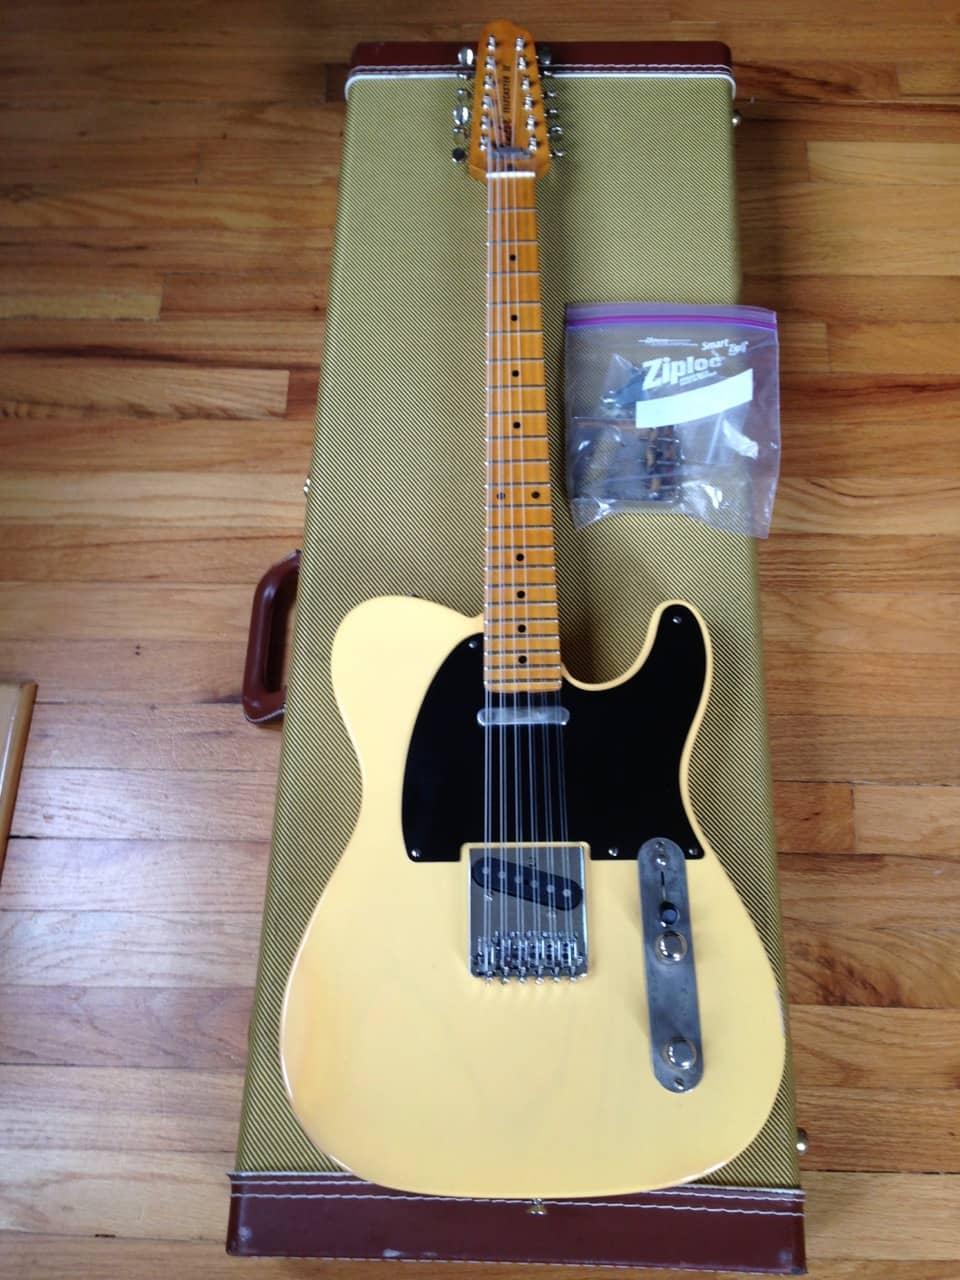 fender rhomco telecaster xii 12 string guitar custom free reverb. Black Bedroom Furniture Sets. Home Design Ideas